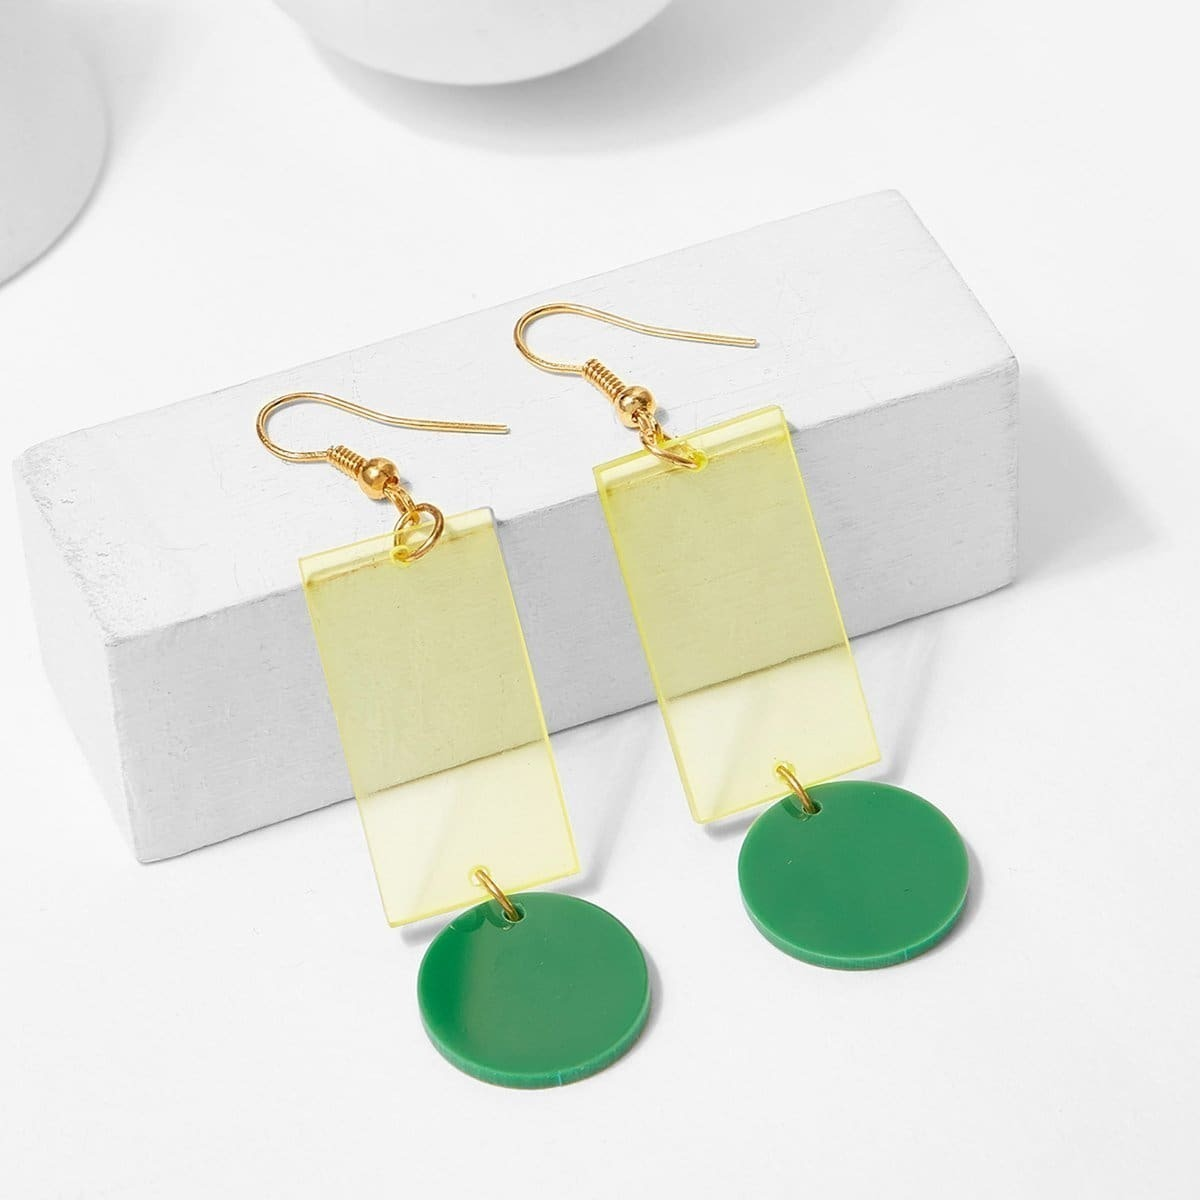 - Translucent Rectangle Drop Earrings